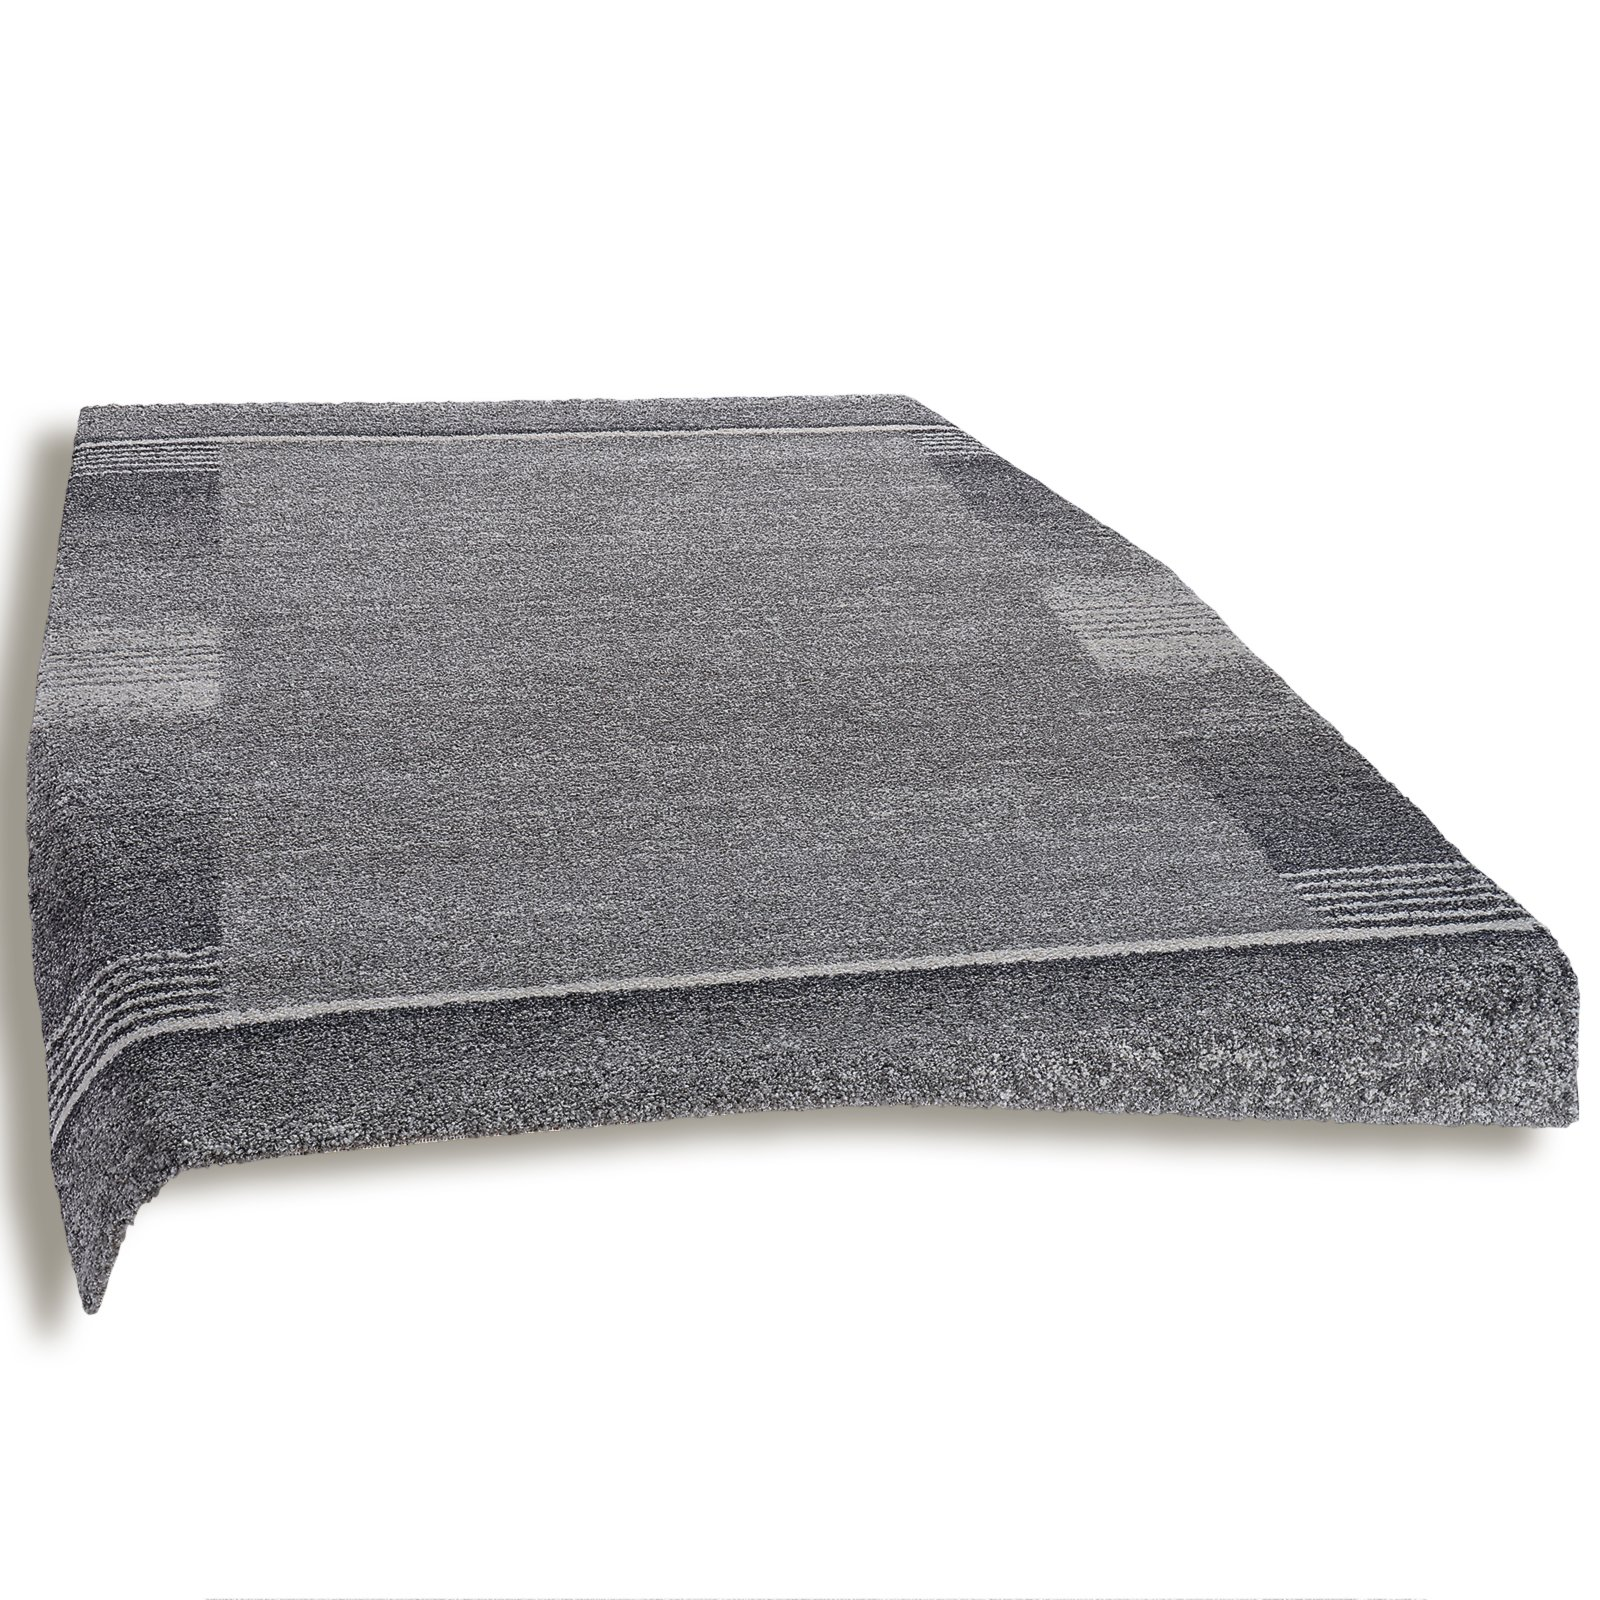 teppich wien dunkelgrau 80x150 cm gemusterte. Black Bedroom Furniture Sets. Home Design Ideas